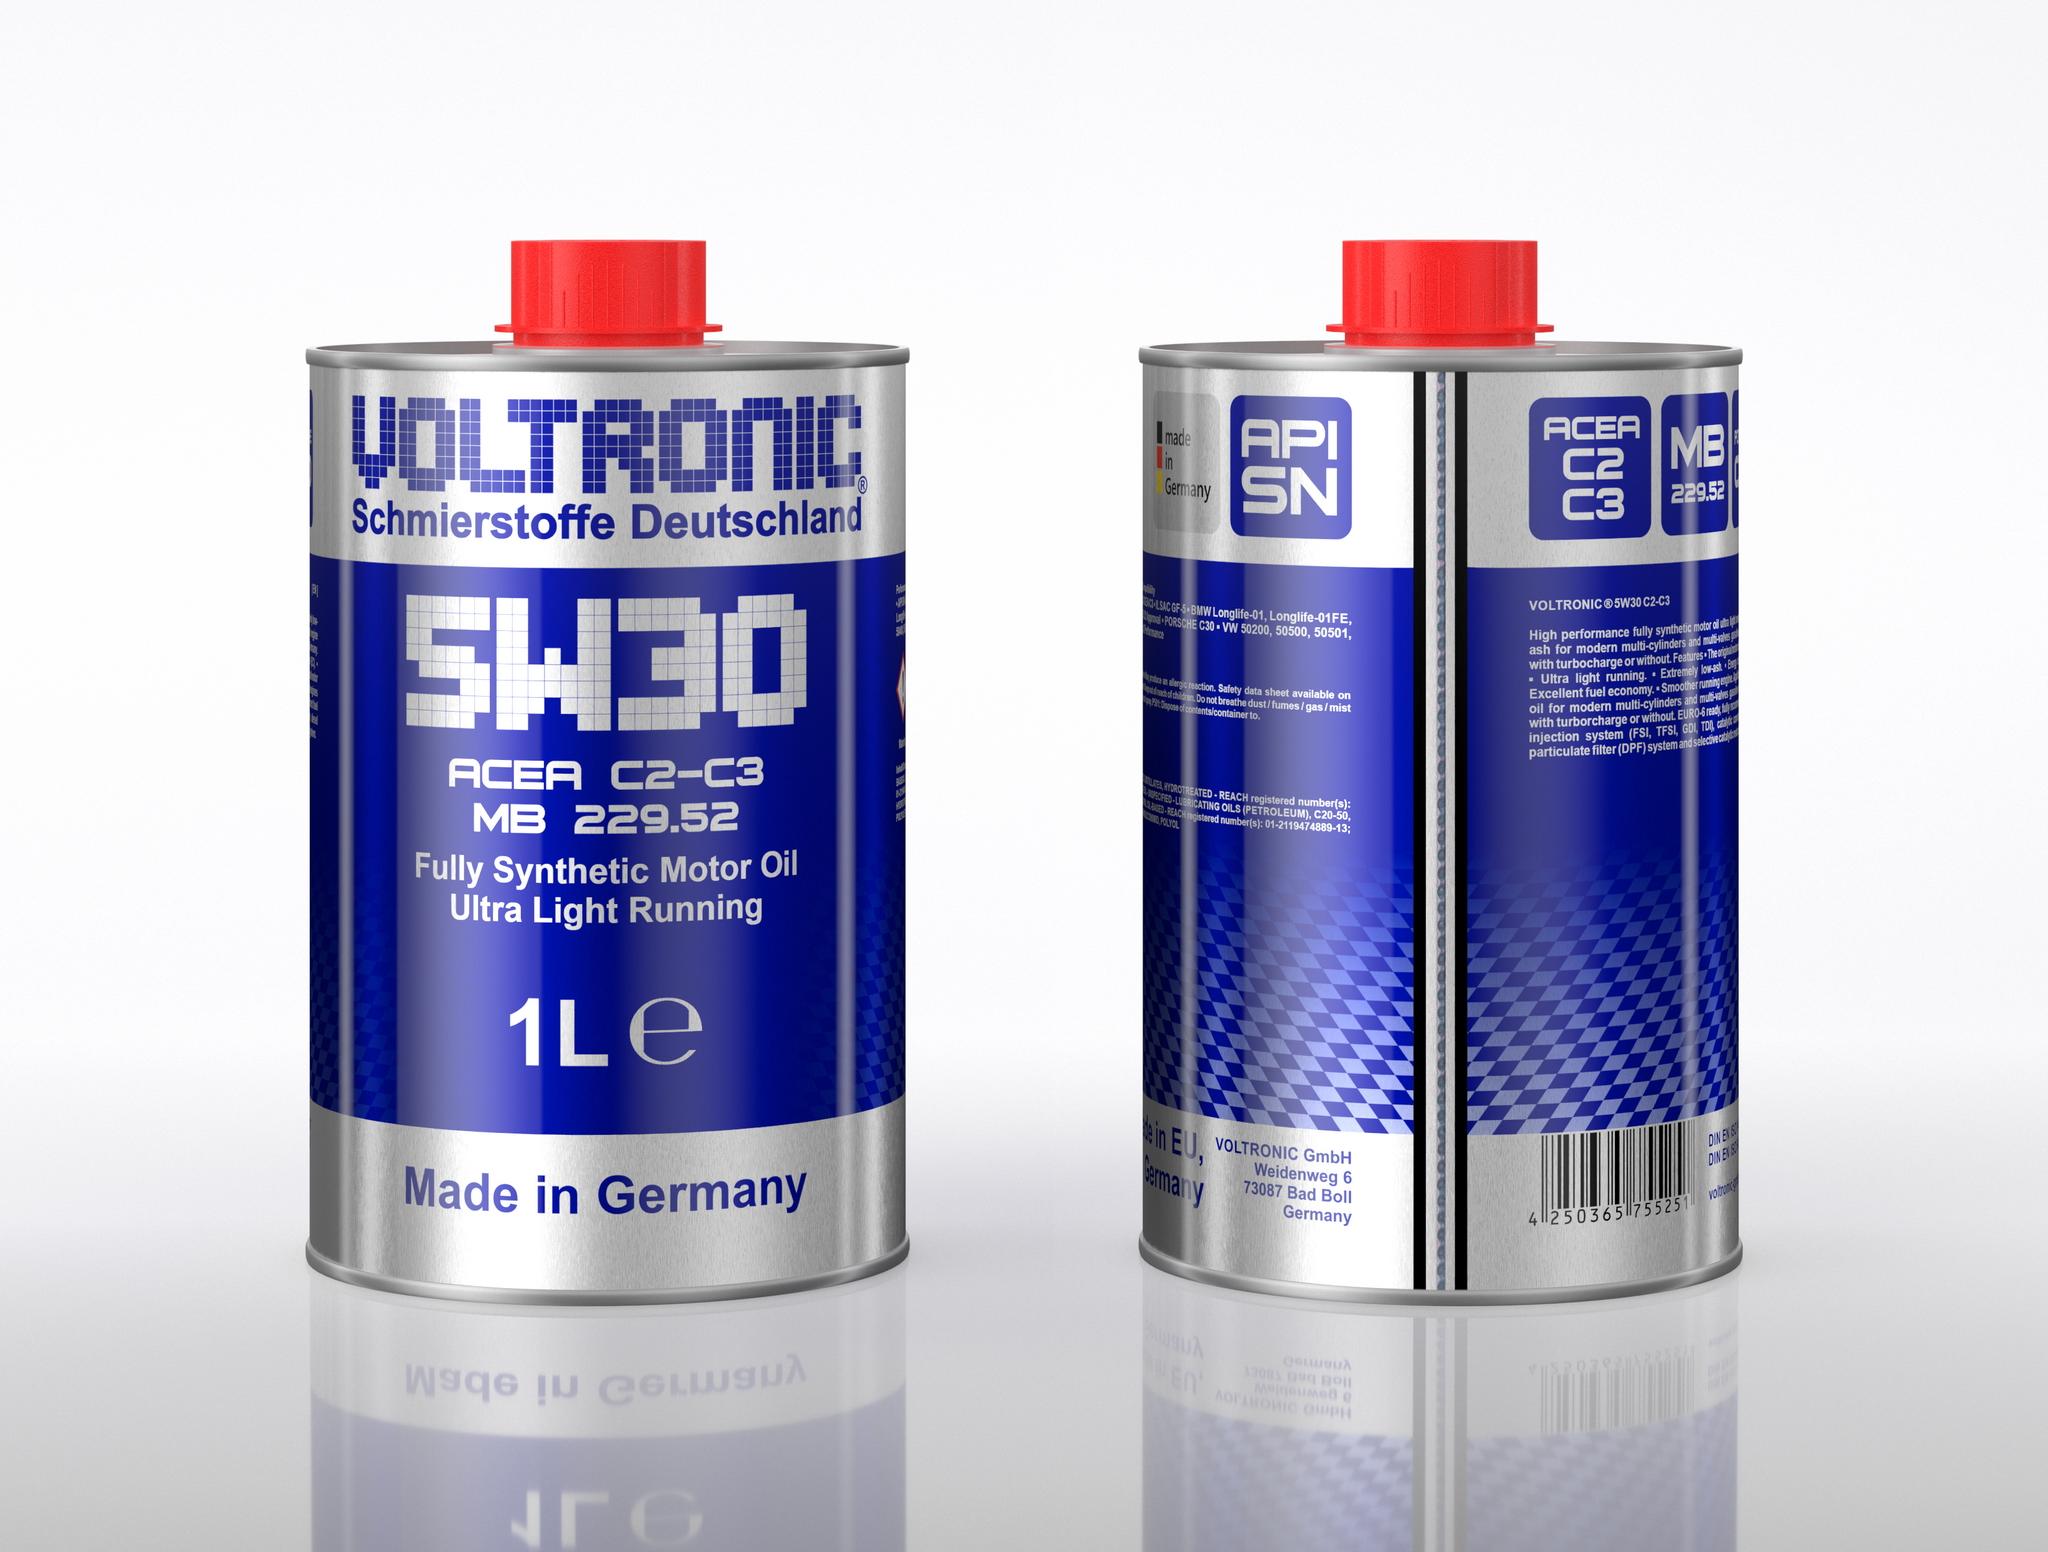 voltronic 5w30 c2-c3